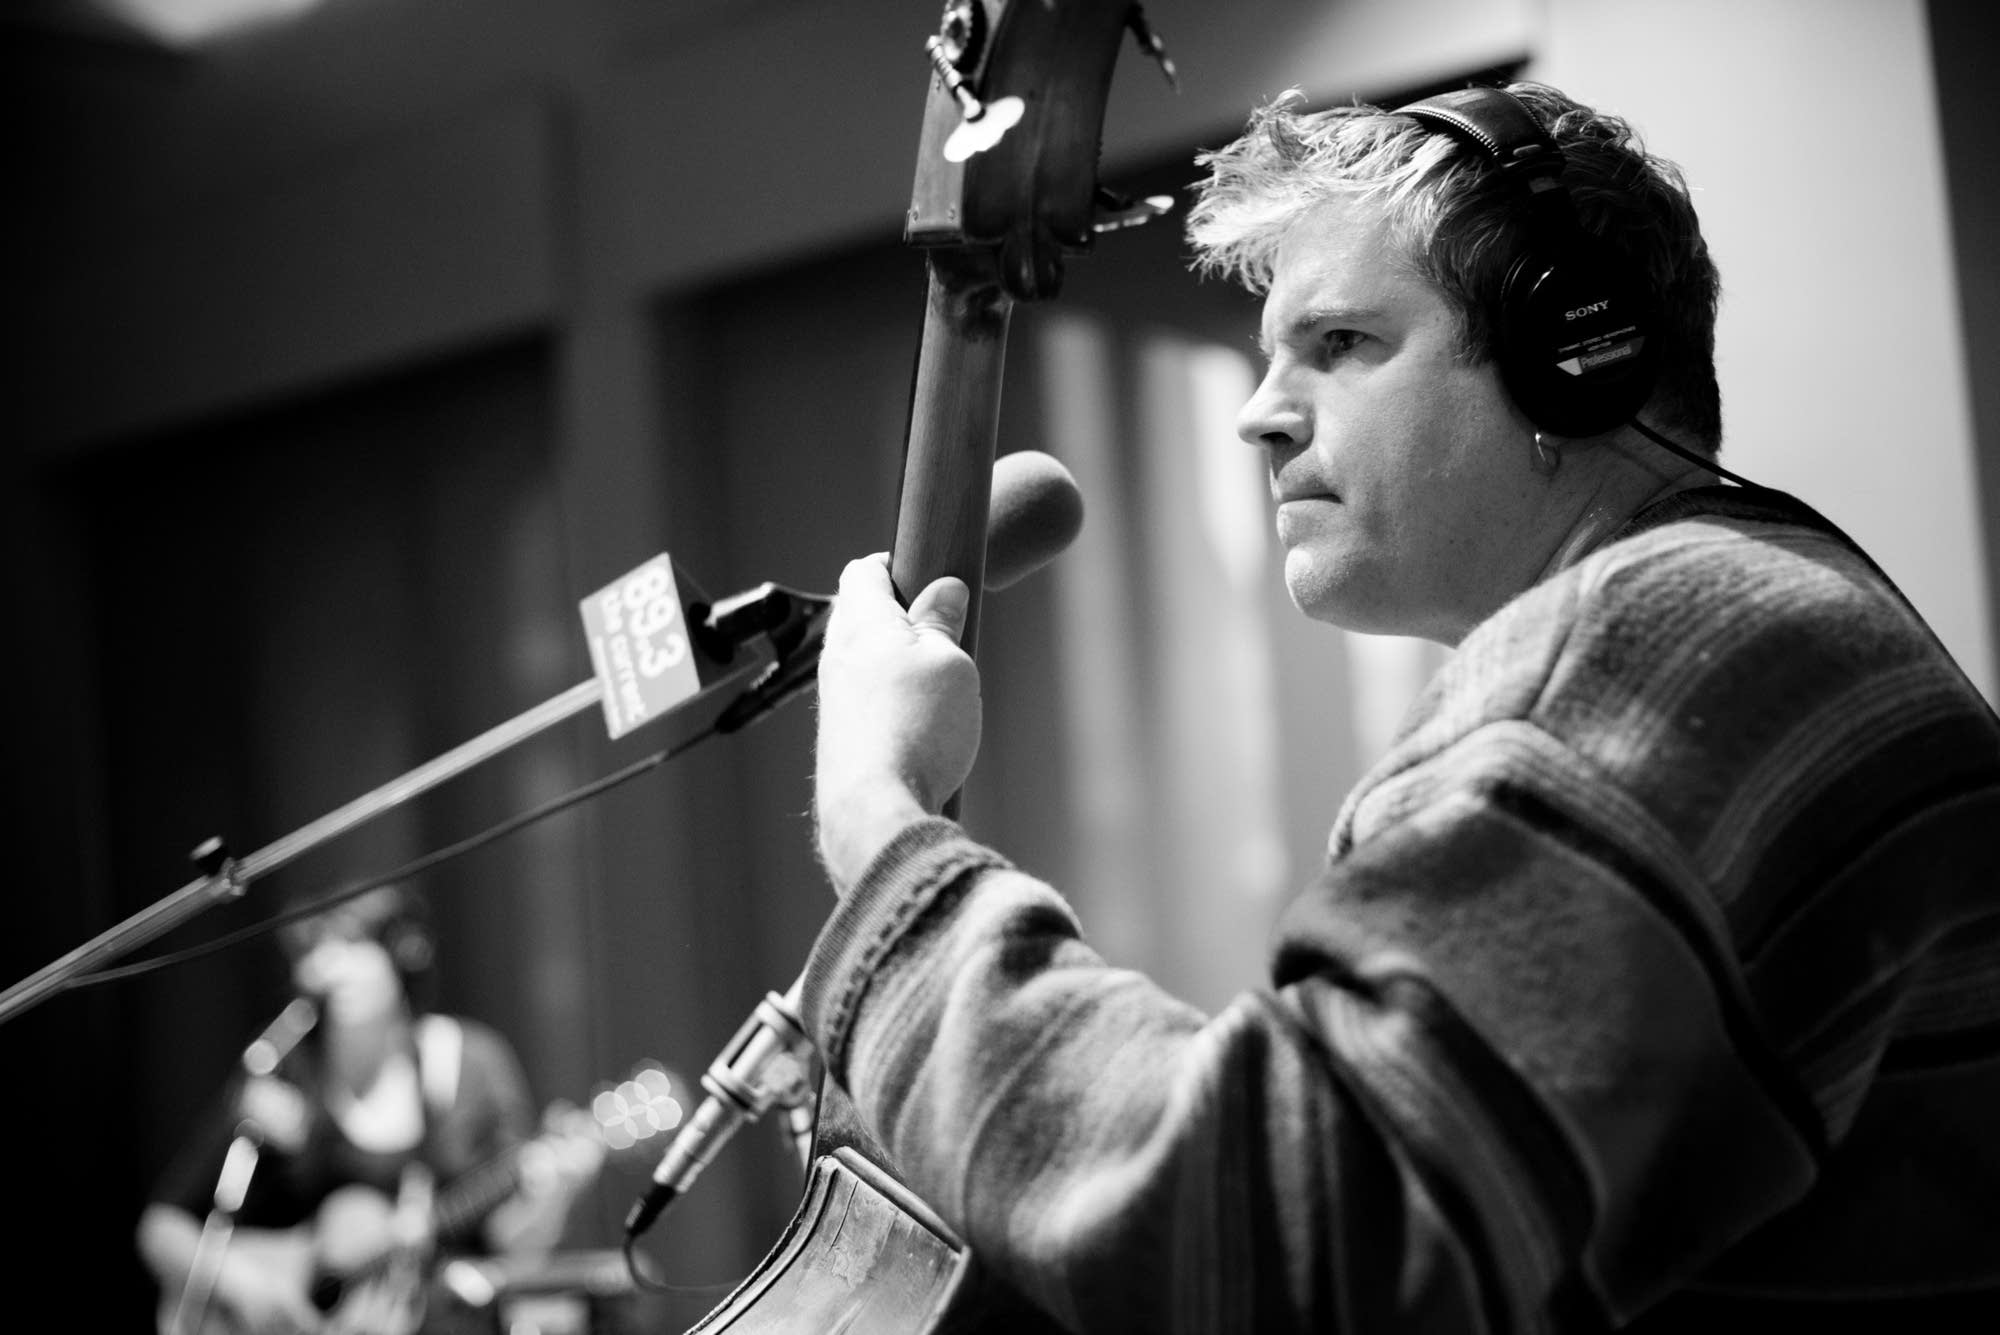 John Munson in The Current's studio